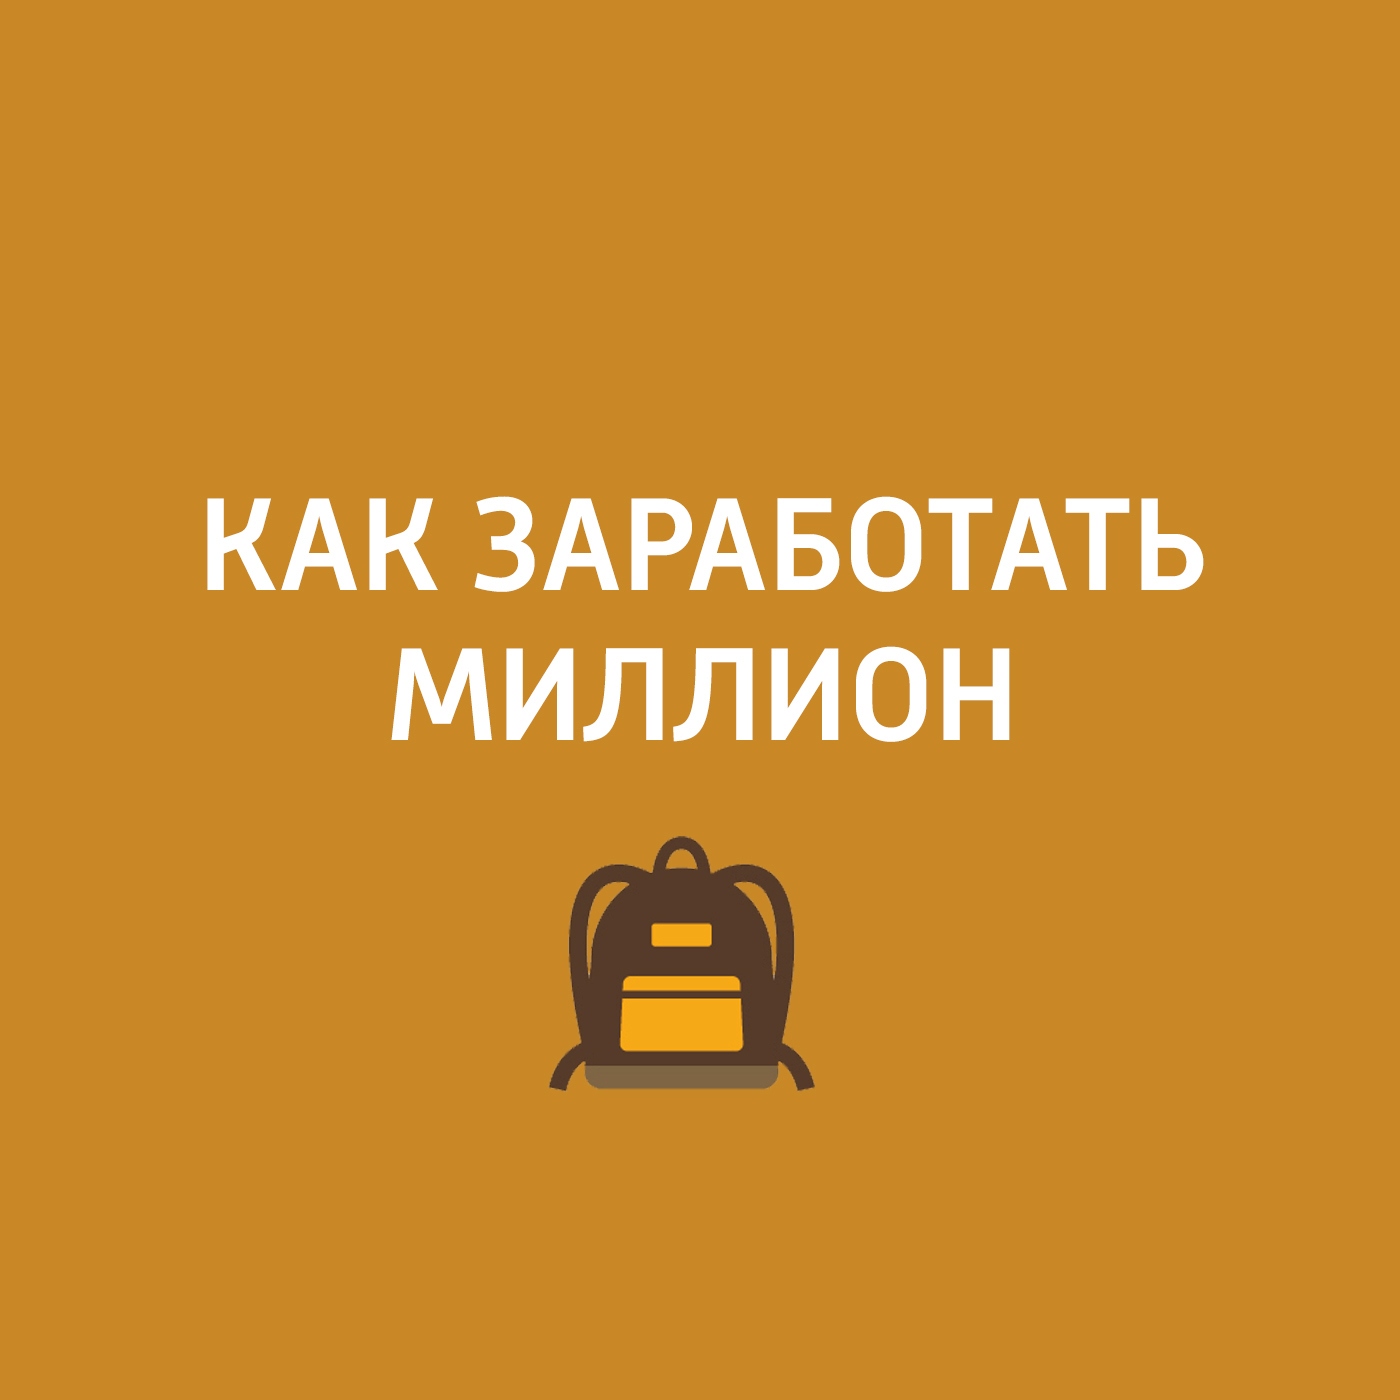 Творческий коллектив шоу «Сергей Стиллавин и его друзья» PLOV.com kulinariya 2488 kak prigotovit uzbekskiy plov html